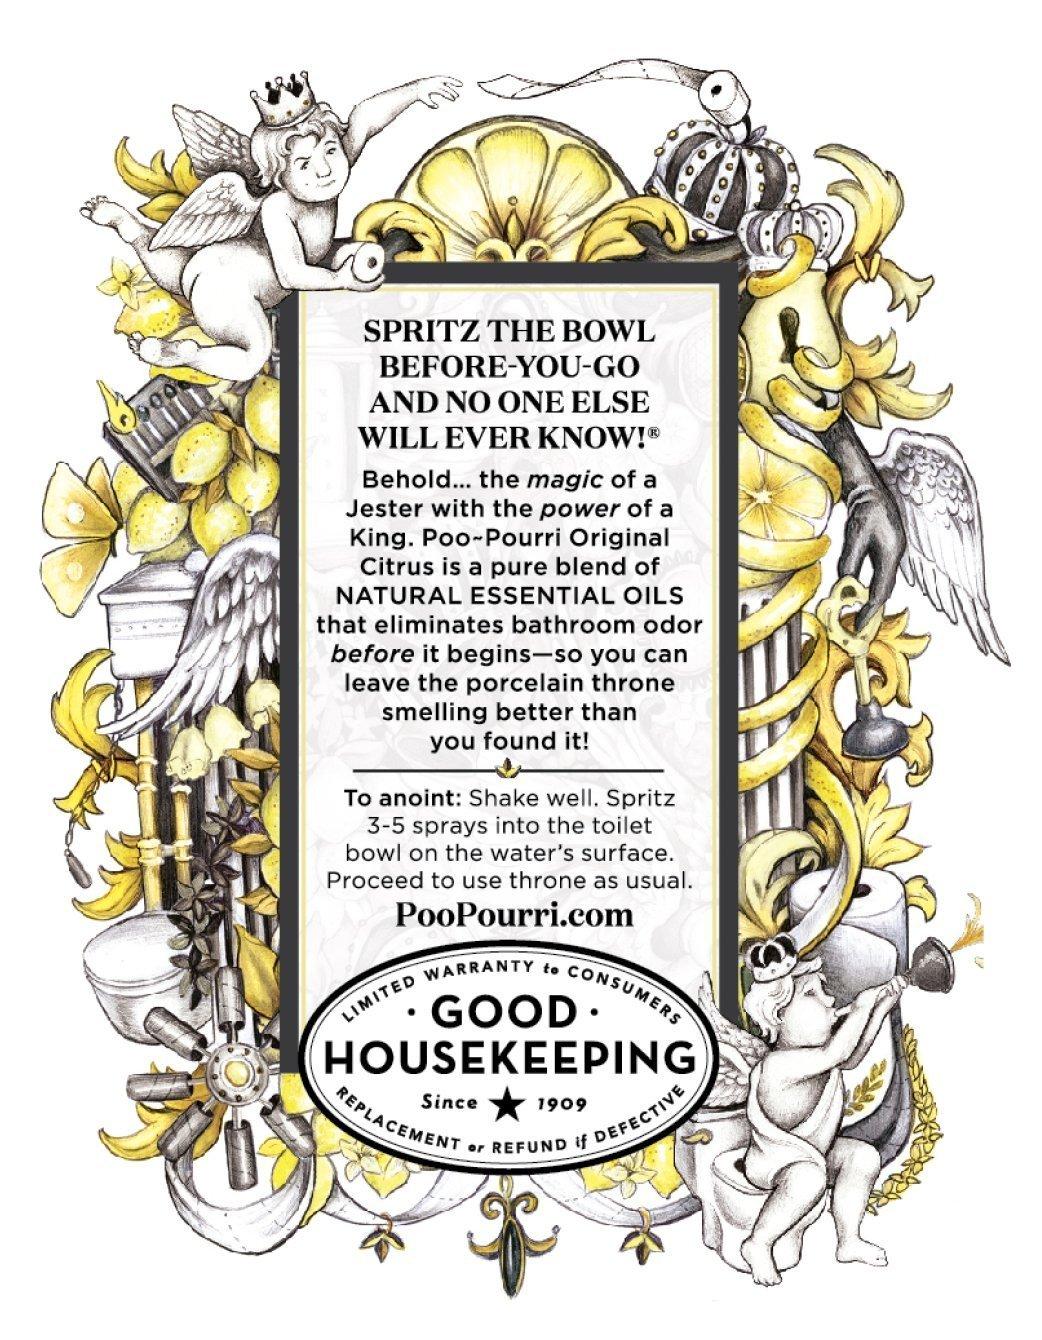 Poo-Pourri Vanilla Mint 4 Ounce, Tropical Hibiscus 1.4 Ounce and Original Citrus 1.4 Ounce by Poo-Pourri (Image #7)